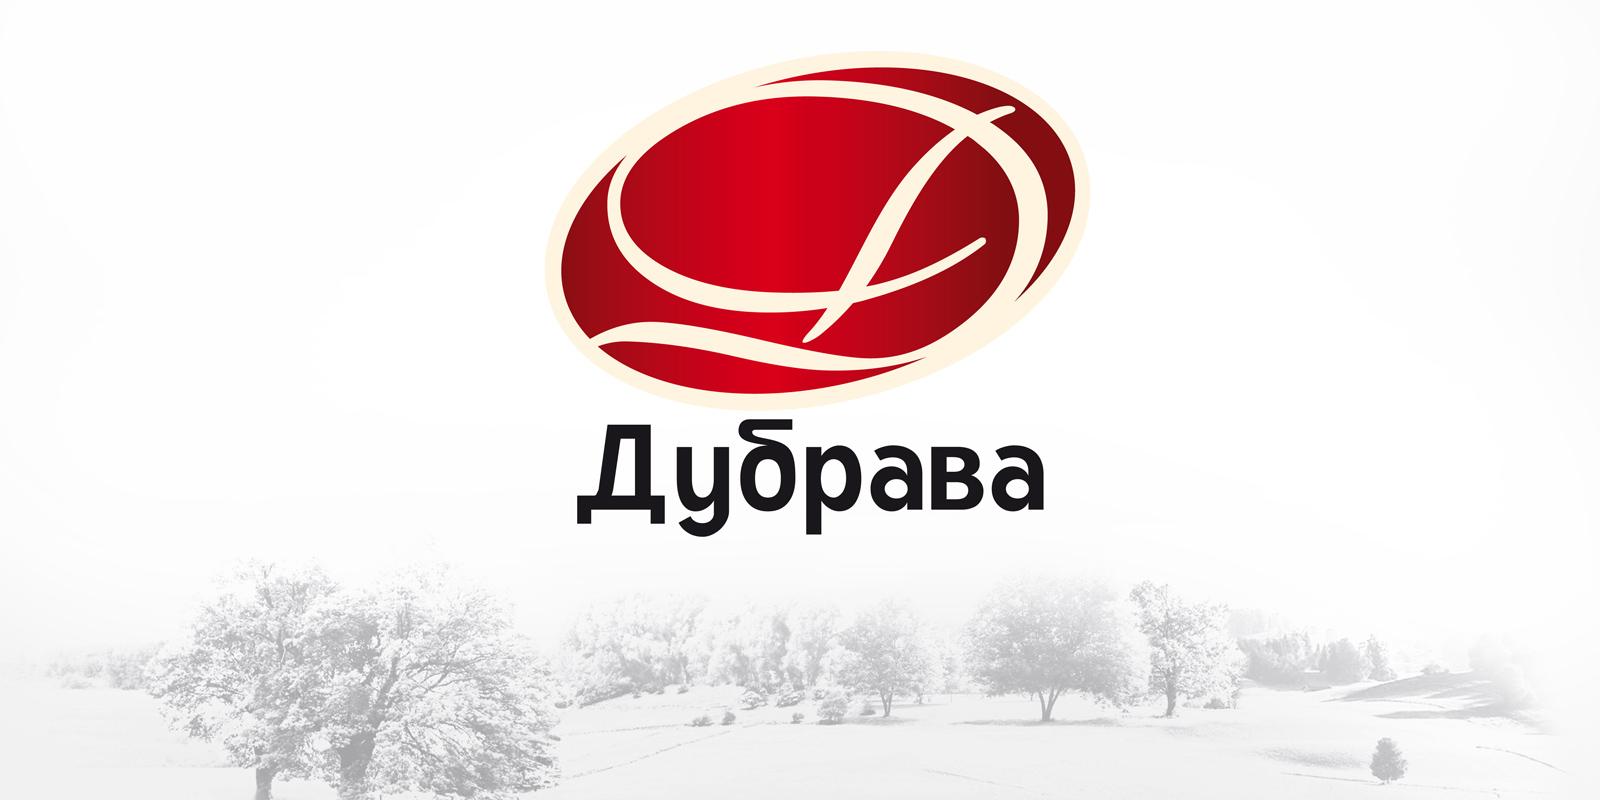 ТМ «Дубрава»;;;;;;Разработка логотипа для ТМ «Дубрава»;;;;;;<span>Клиент:</span> ТМ «Дубрава»;;;;;;;;;;;;Разработка логотипа для ТМ «Дубрава»;;;;;;1